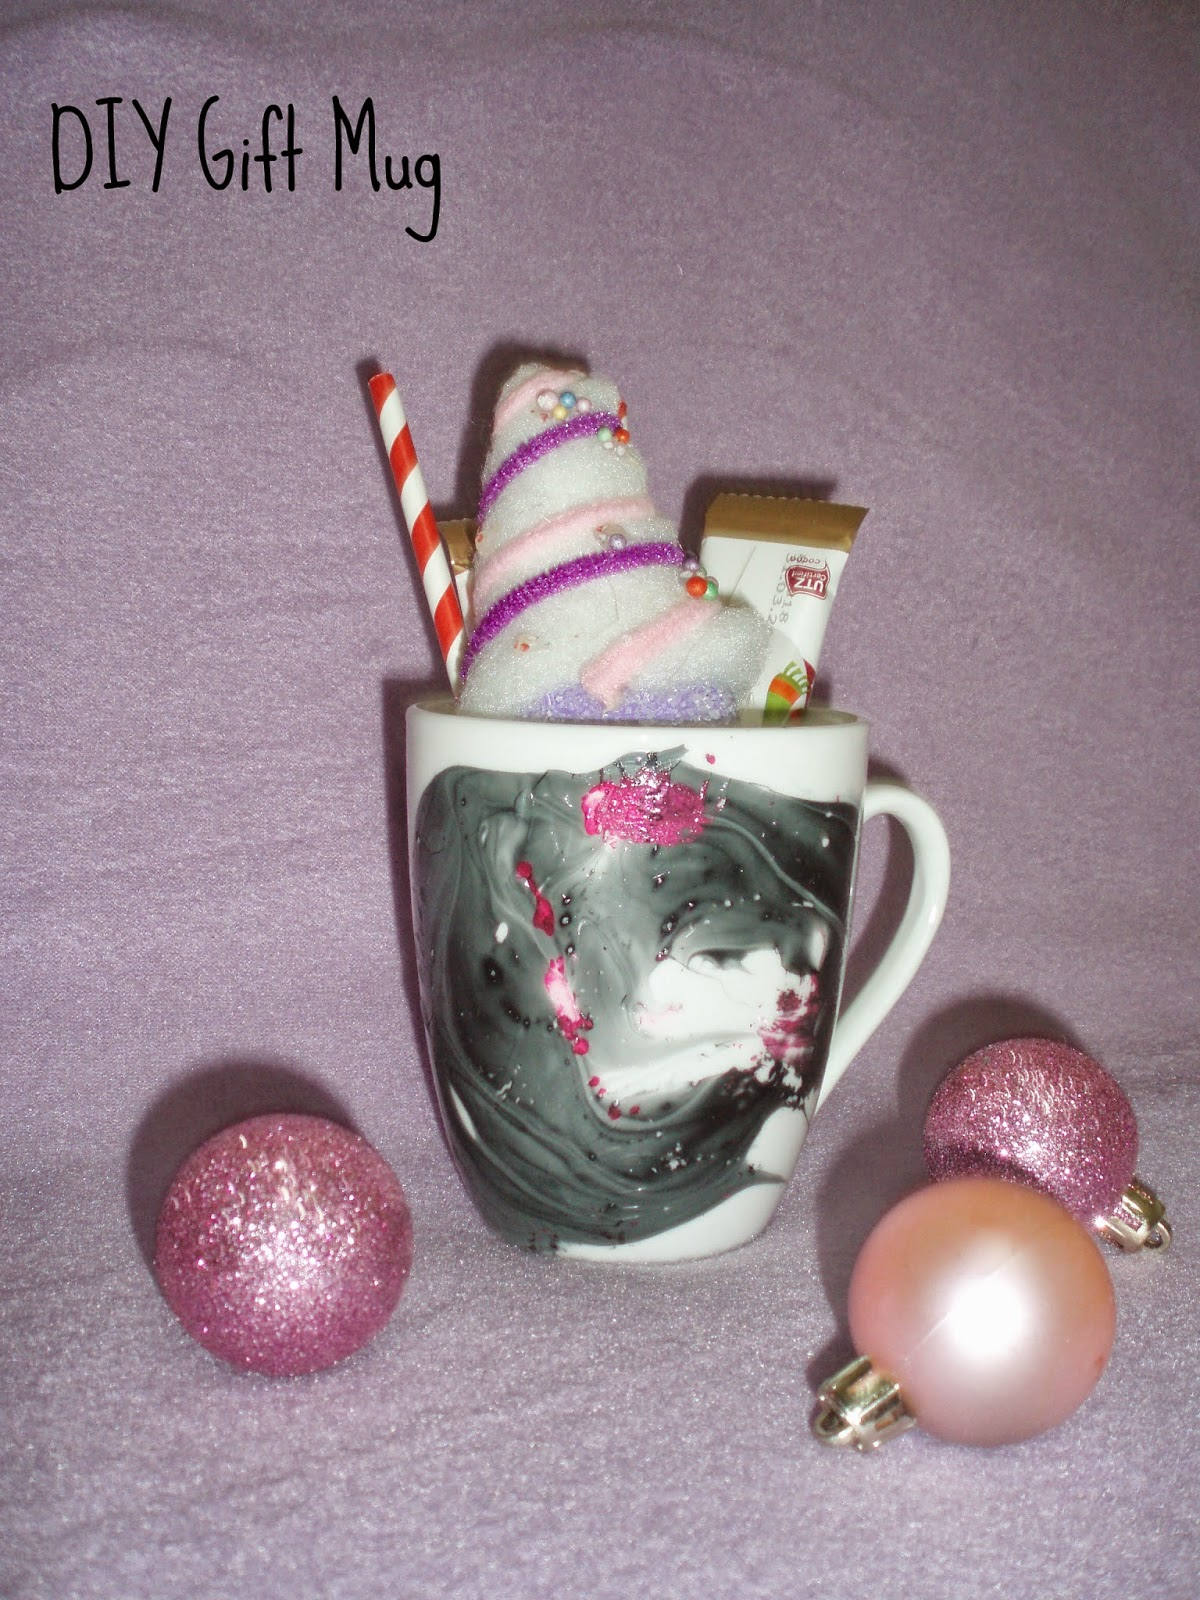 DIY Watercolor gift Mug κούπα με εφε νερομπογιας